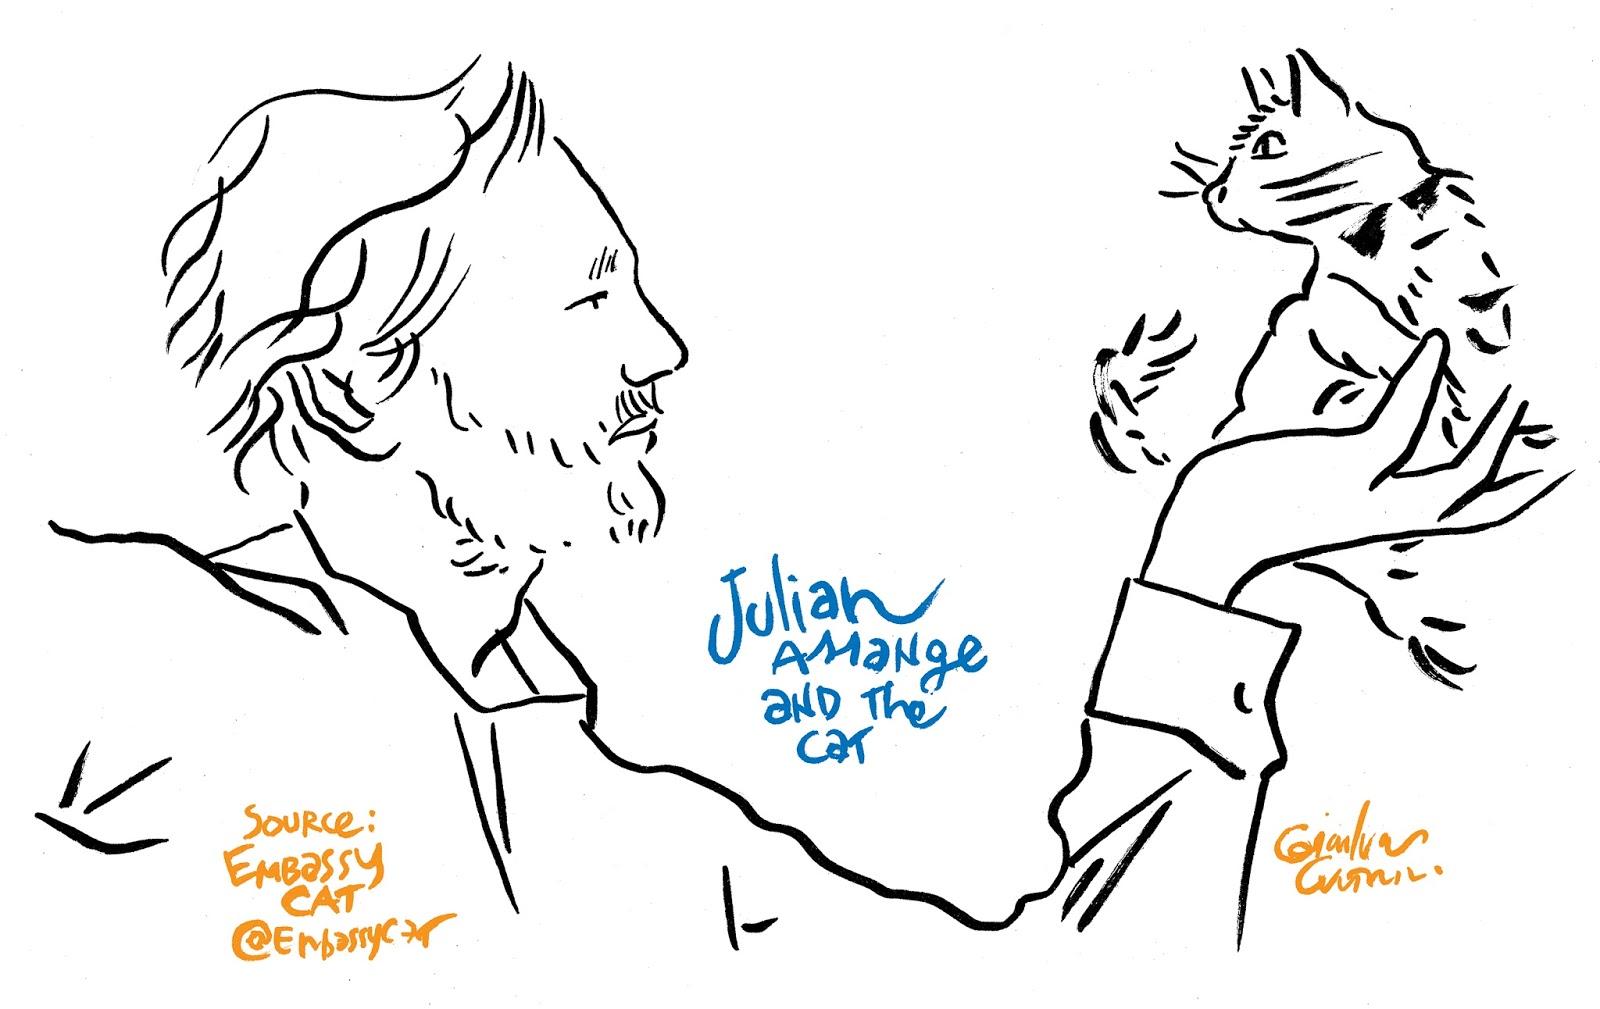 Julian Assange S Cat S Name